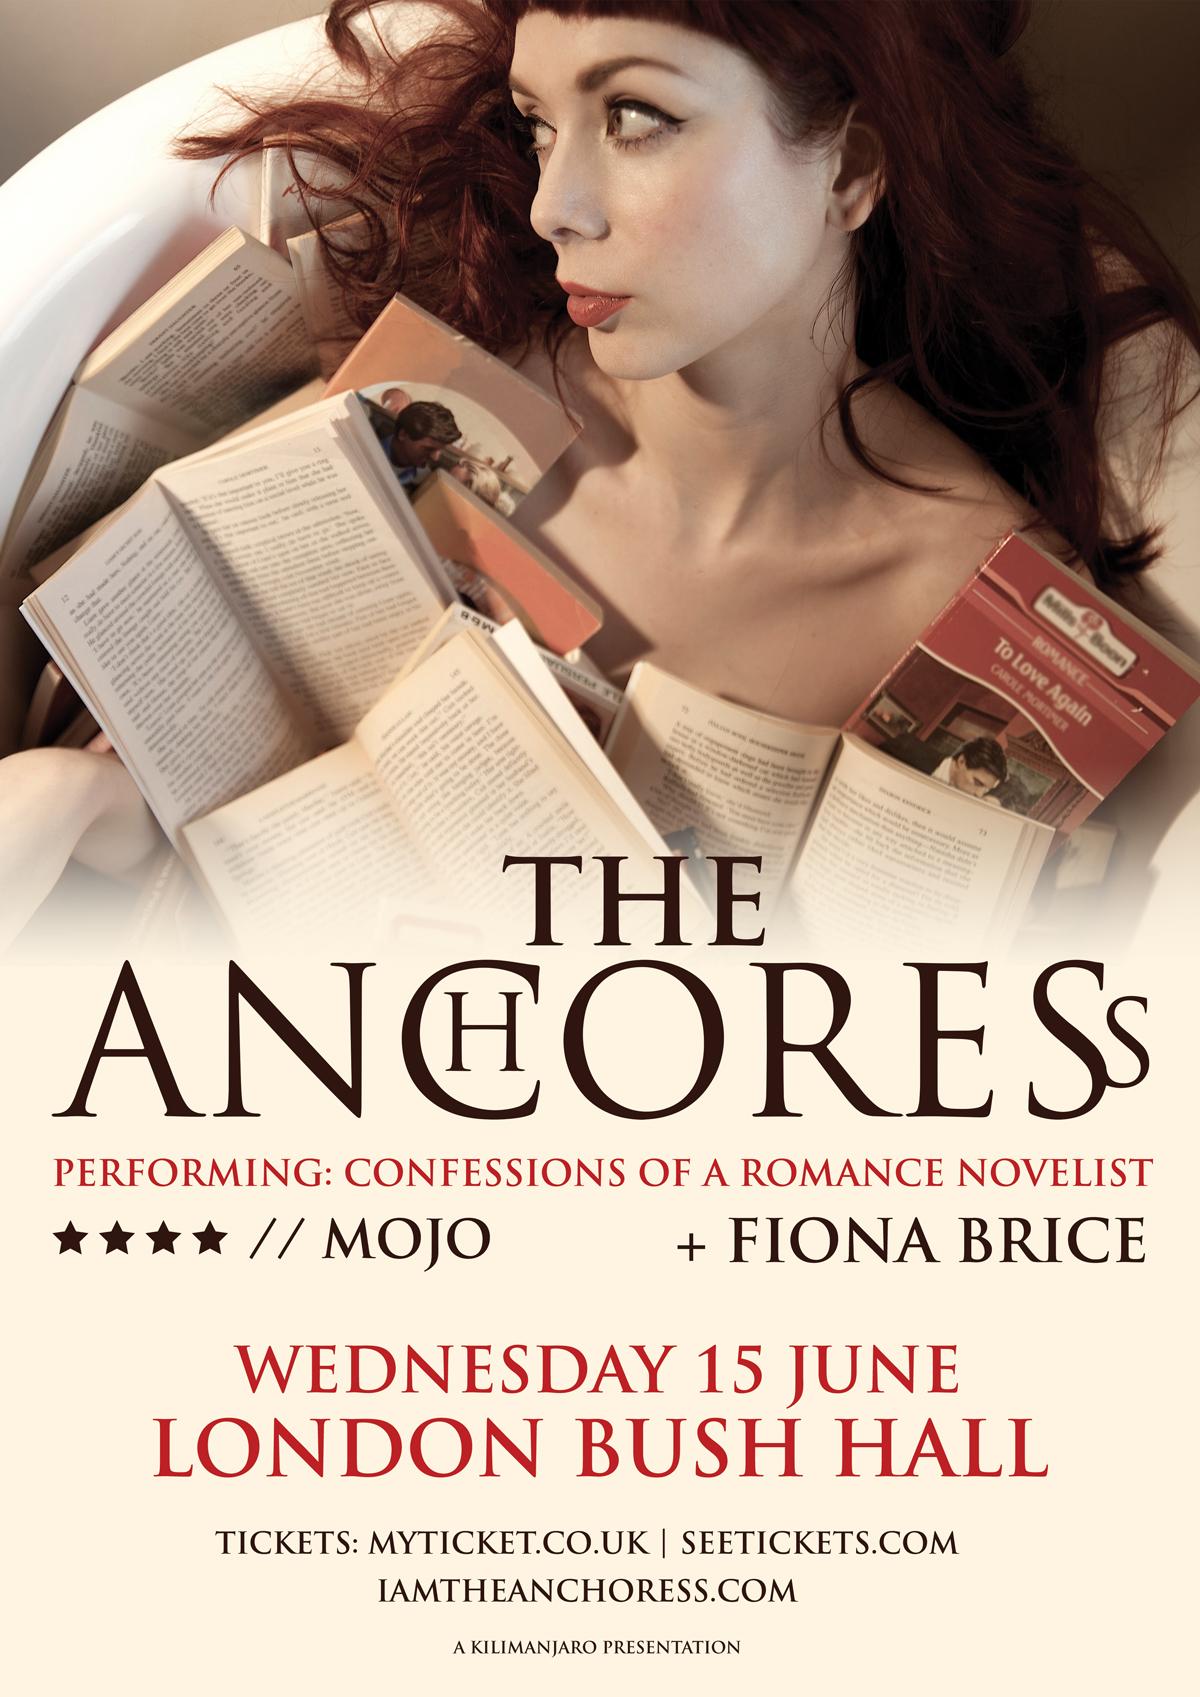 THE ANCHORESS + Fiona Brice